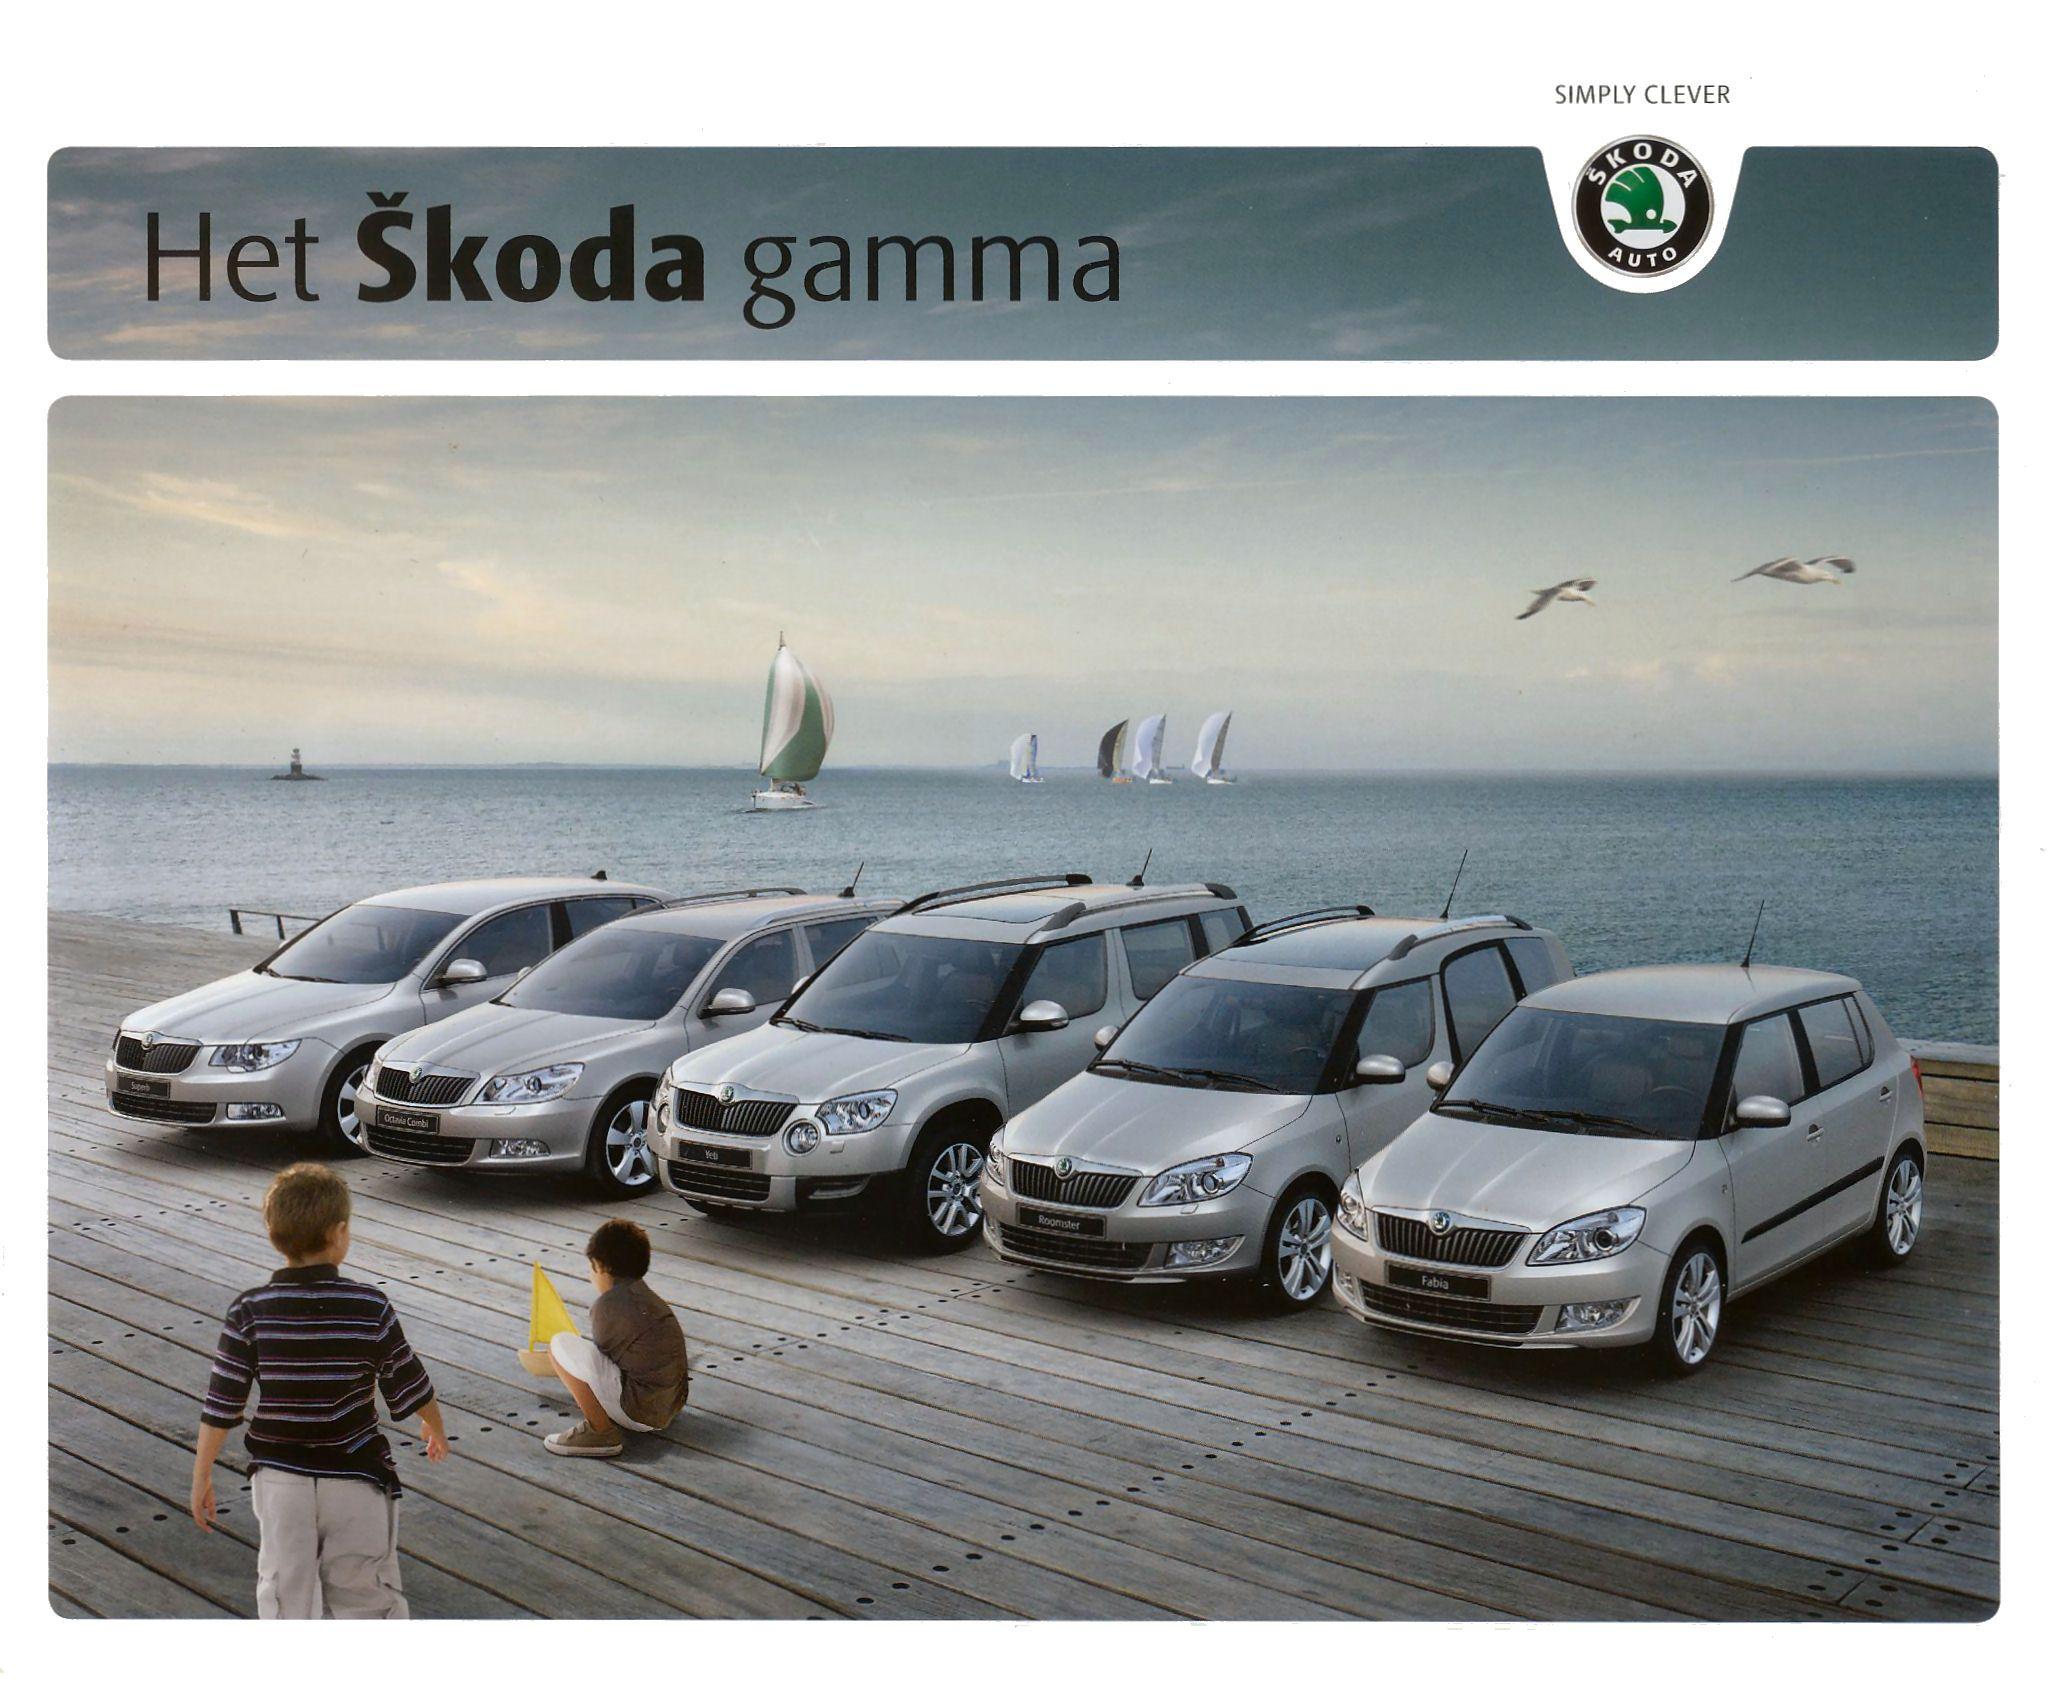 2010 Skoda Superb Brochure